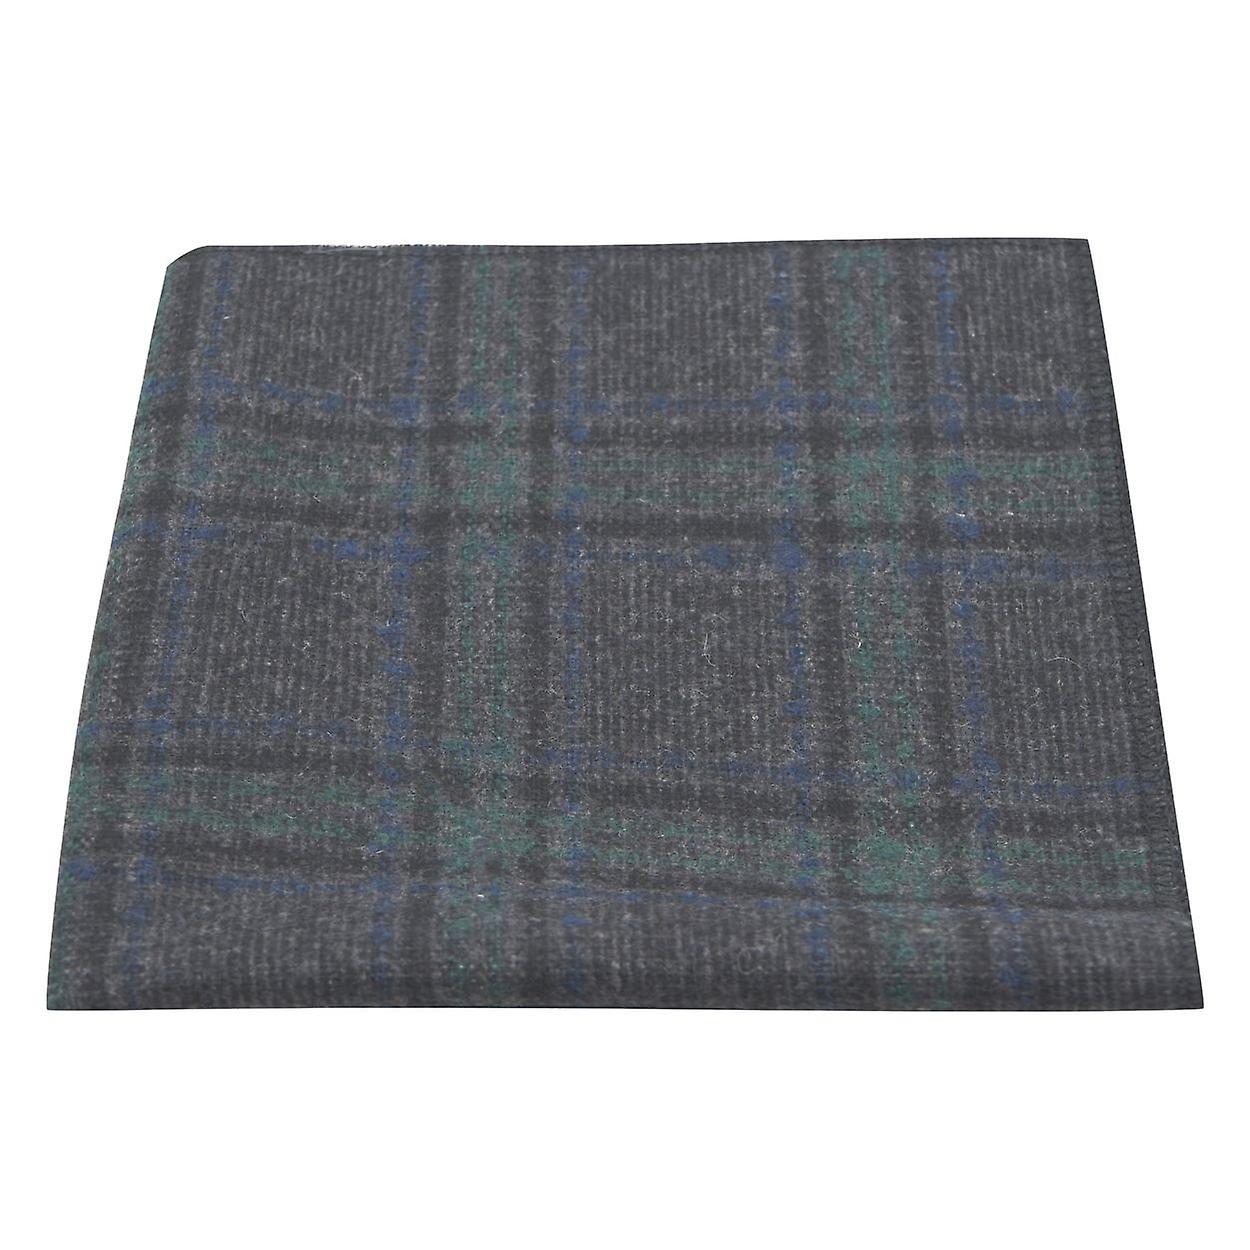 Dark Grey & Green Check Pocket Square, Tweed, Tartan, Plaid